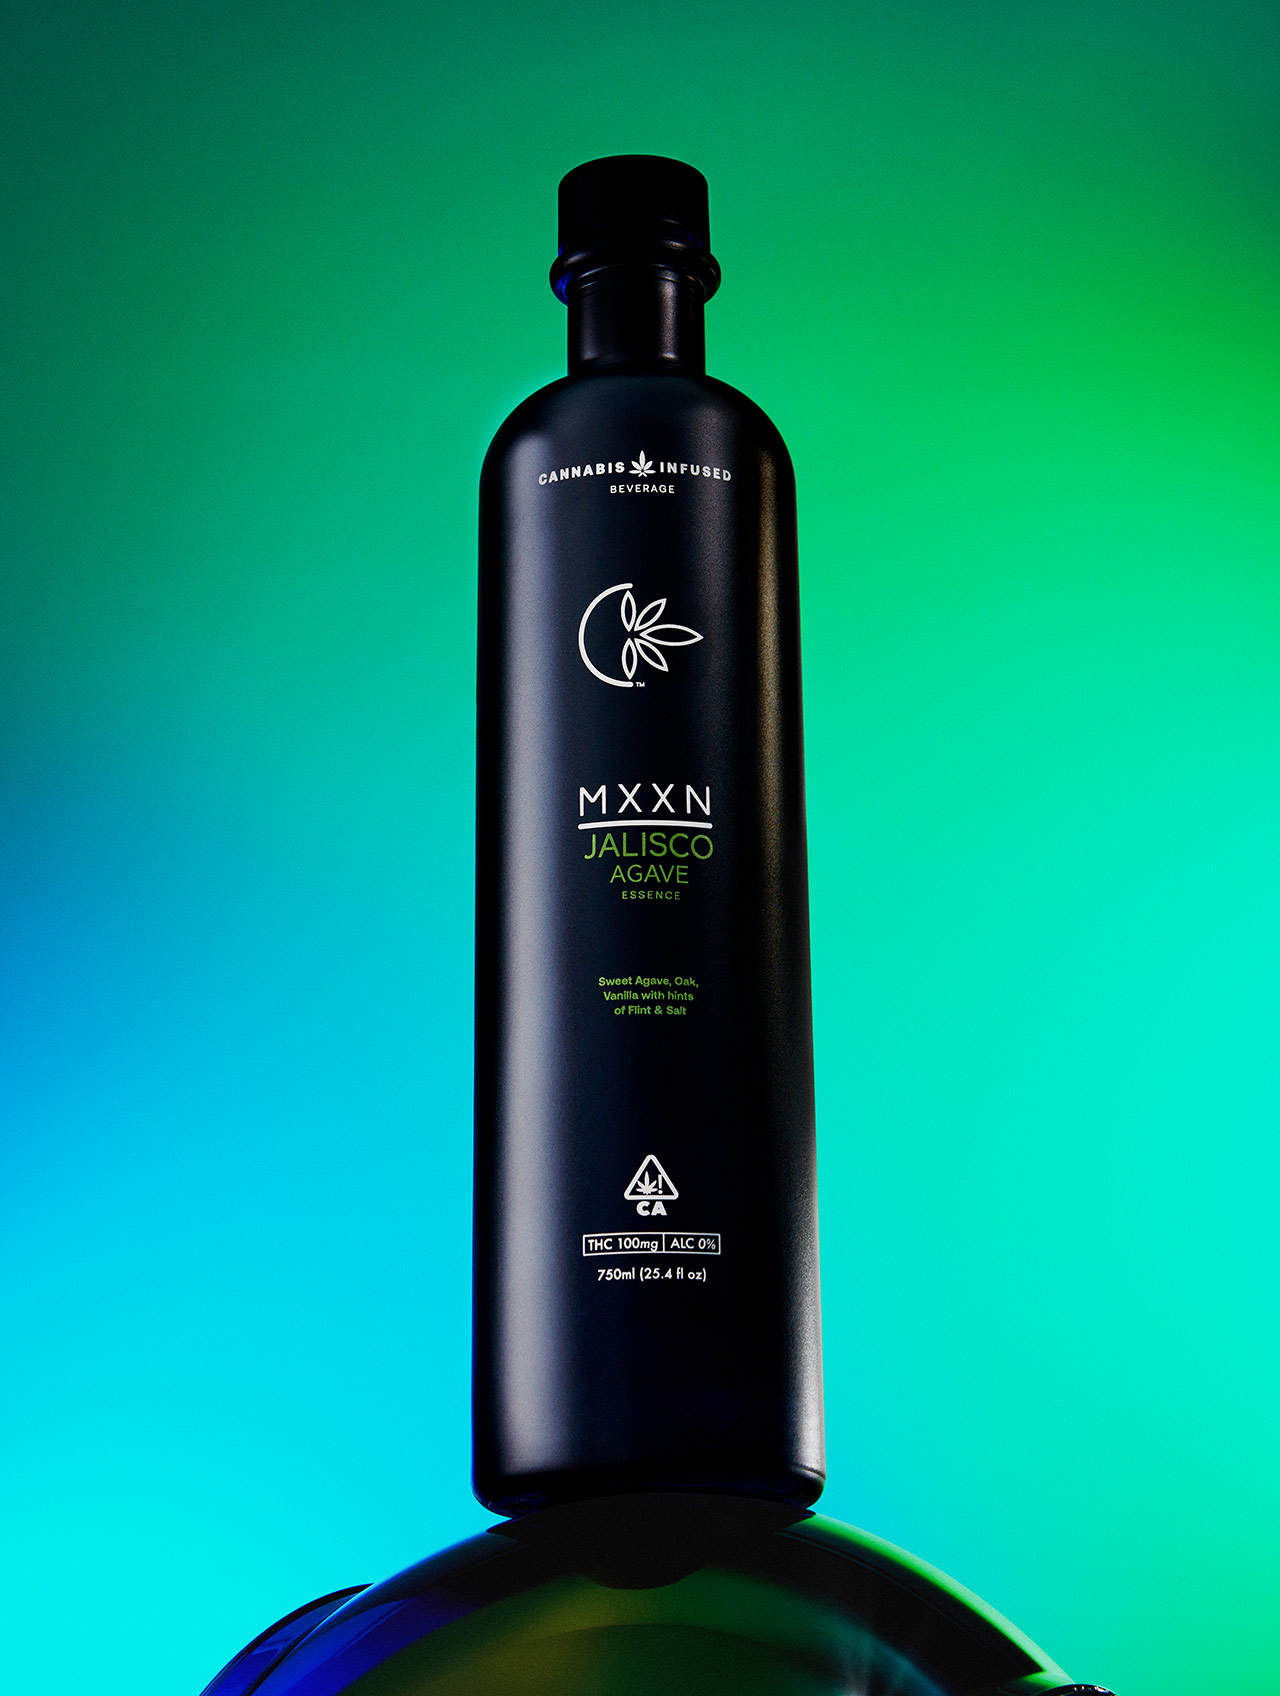 MXXN Jalisco Agave: THC-Infused, Alcohol-Free Spirit